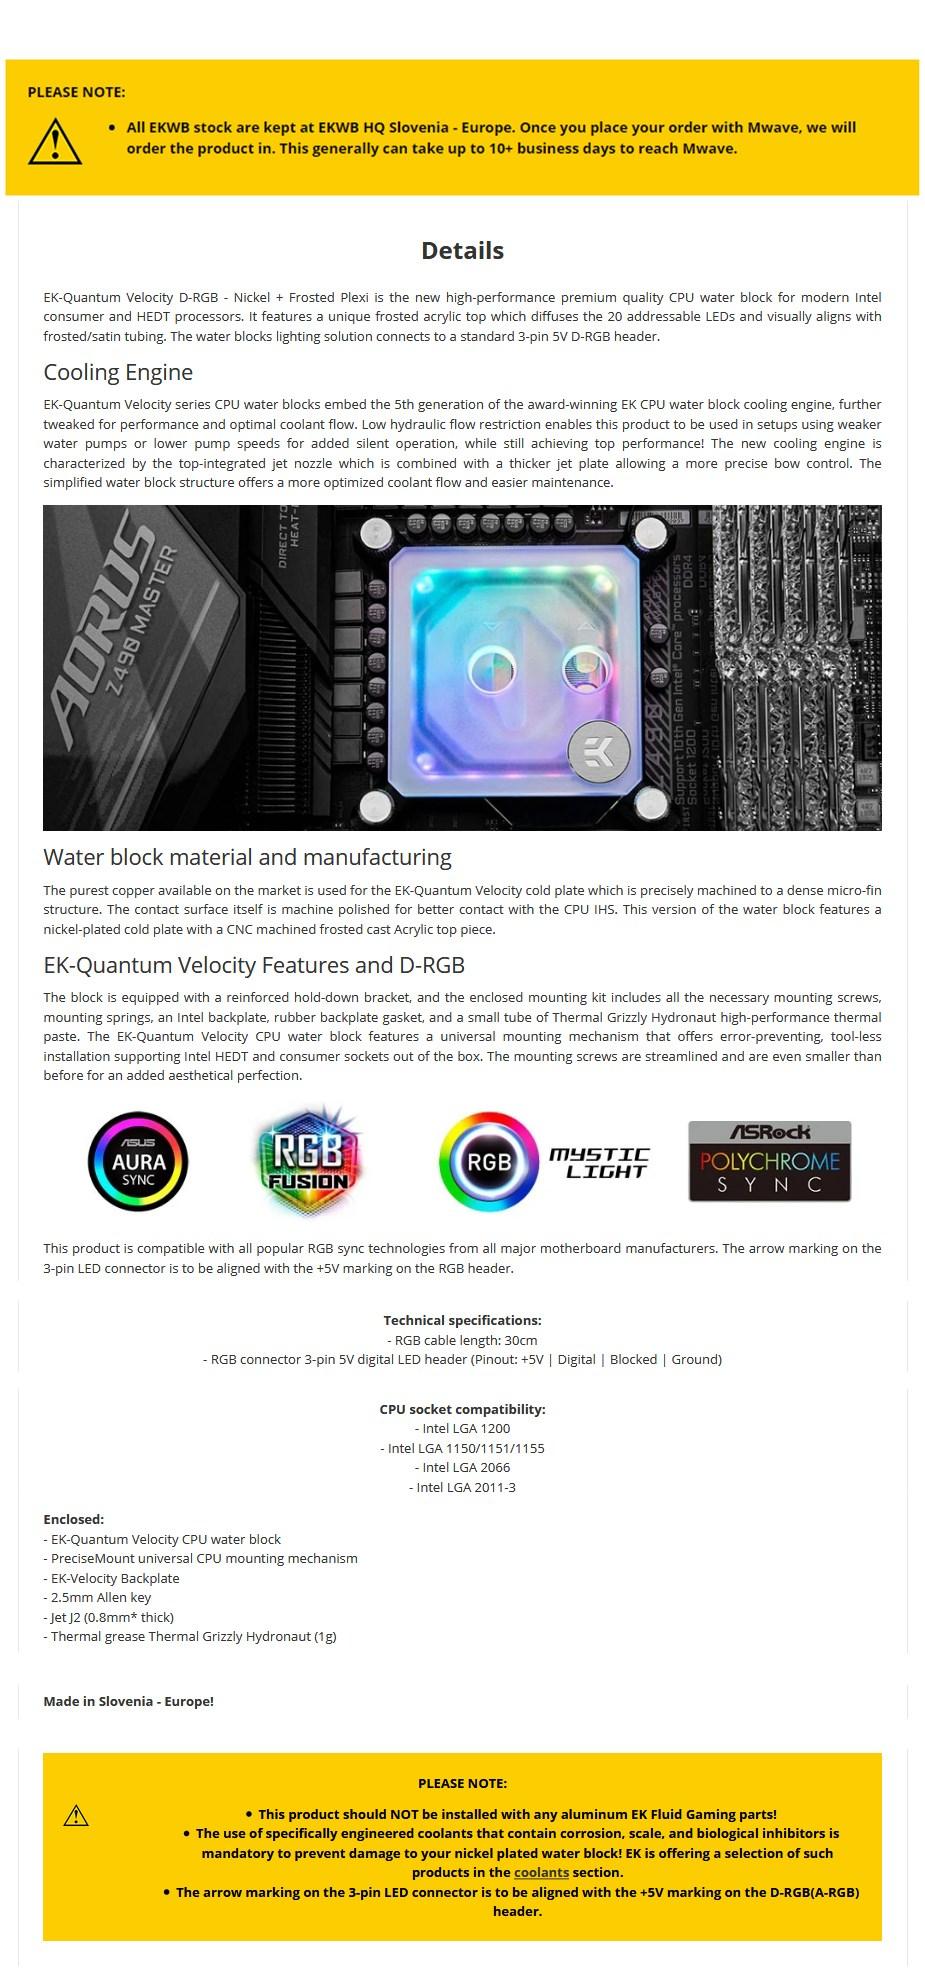 EKWB EK-Quantum Velocity D-RGB CPU Waterblock Nickel + Frosted Plexi - Intel - Overview 1